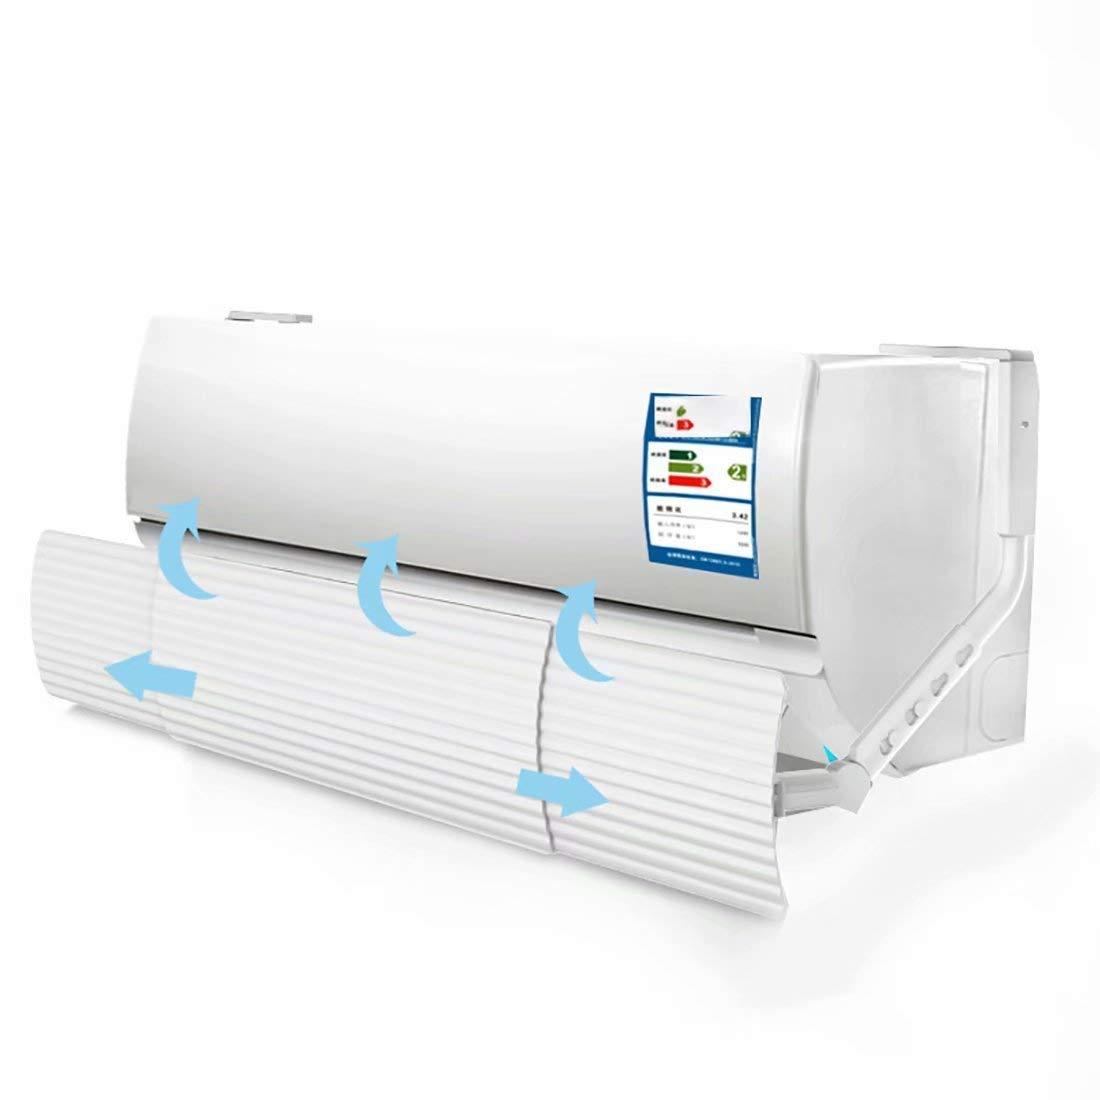 Cheap Vent Air Deflector, find Vent Air Deflector deals on